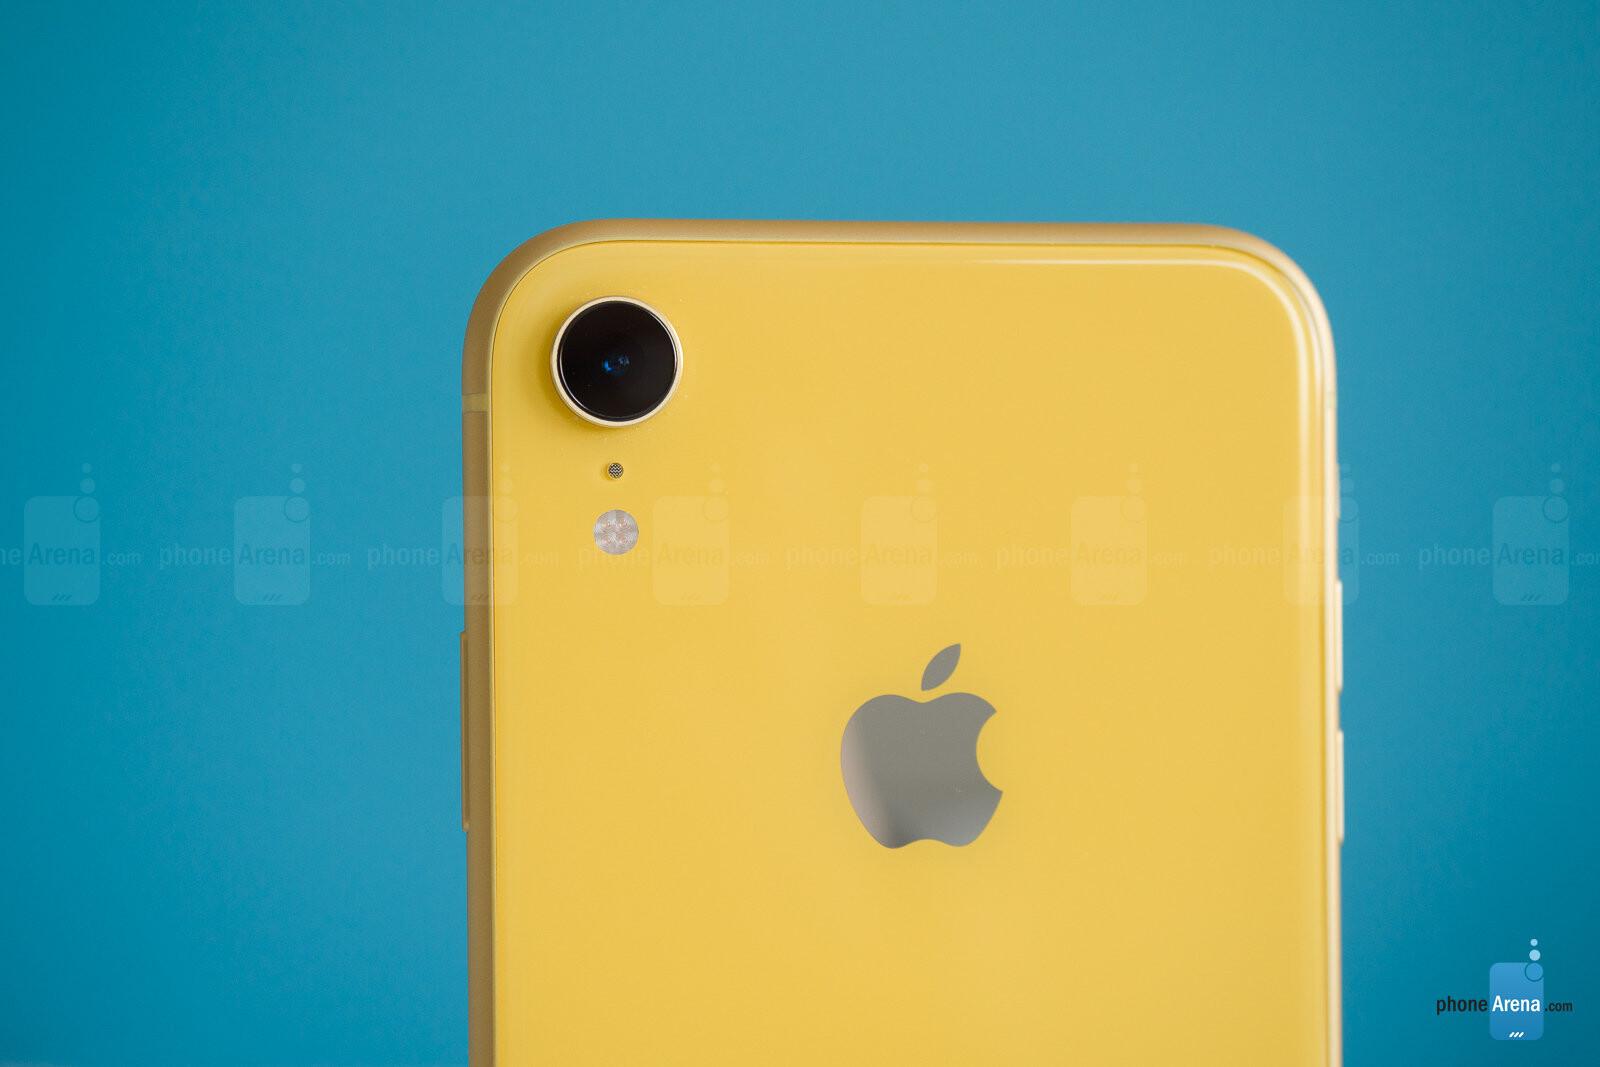 Apple iPhone XR Review - PhoneArena